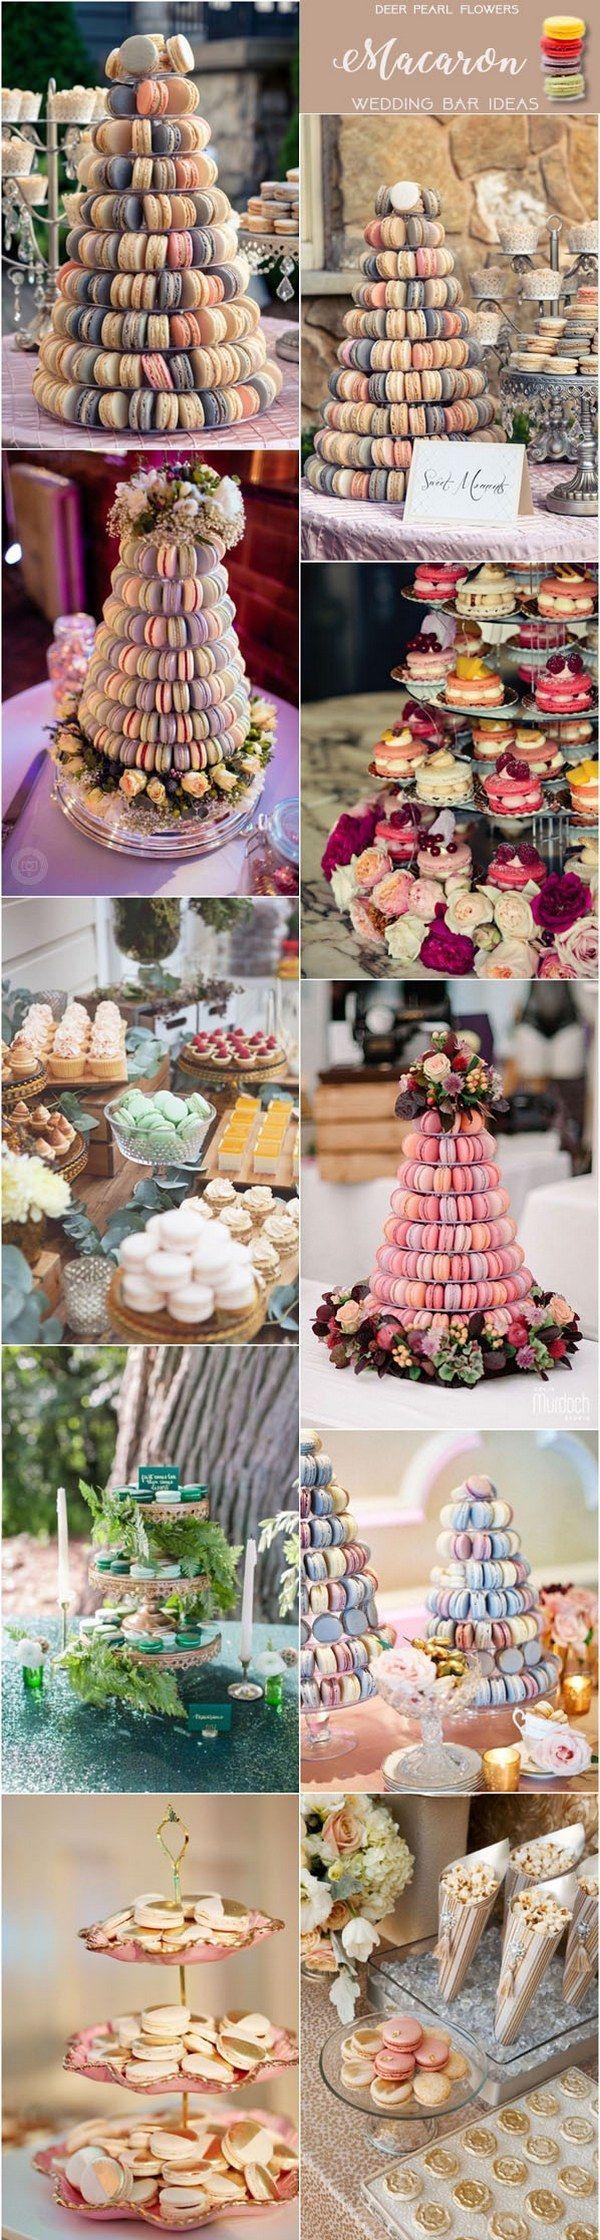 Wedding Catering Trends Top 8 Wedding Dessert Bar Ideas Macaron